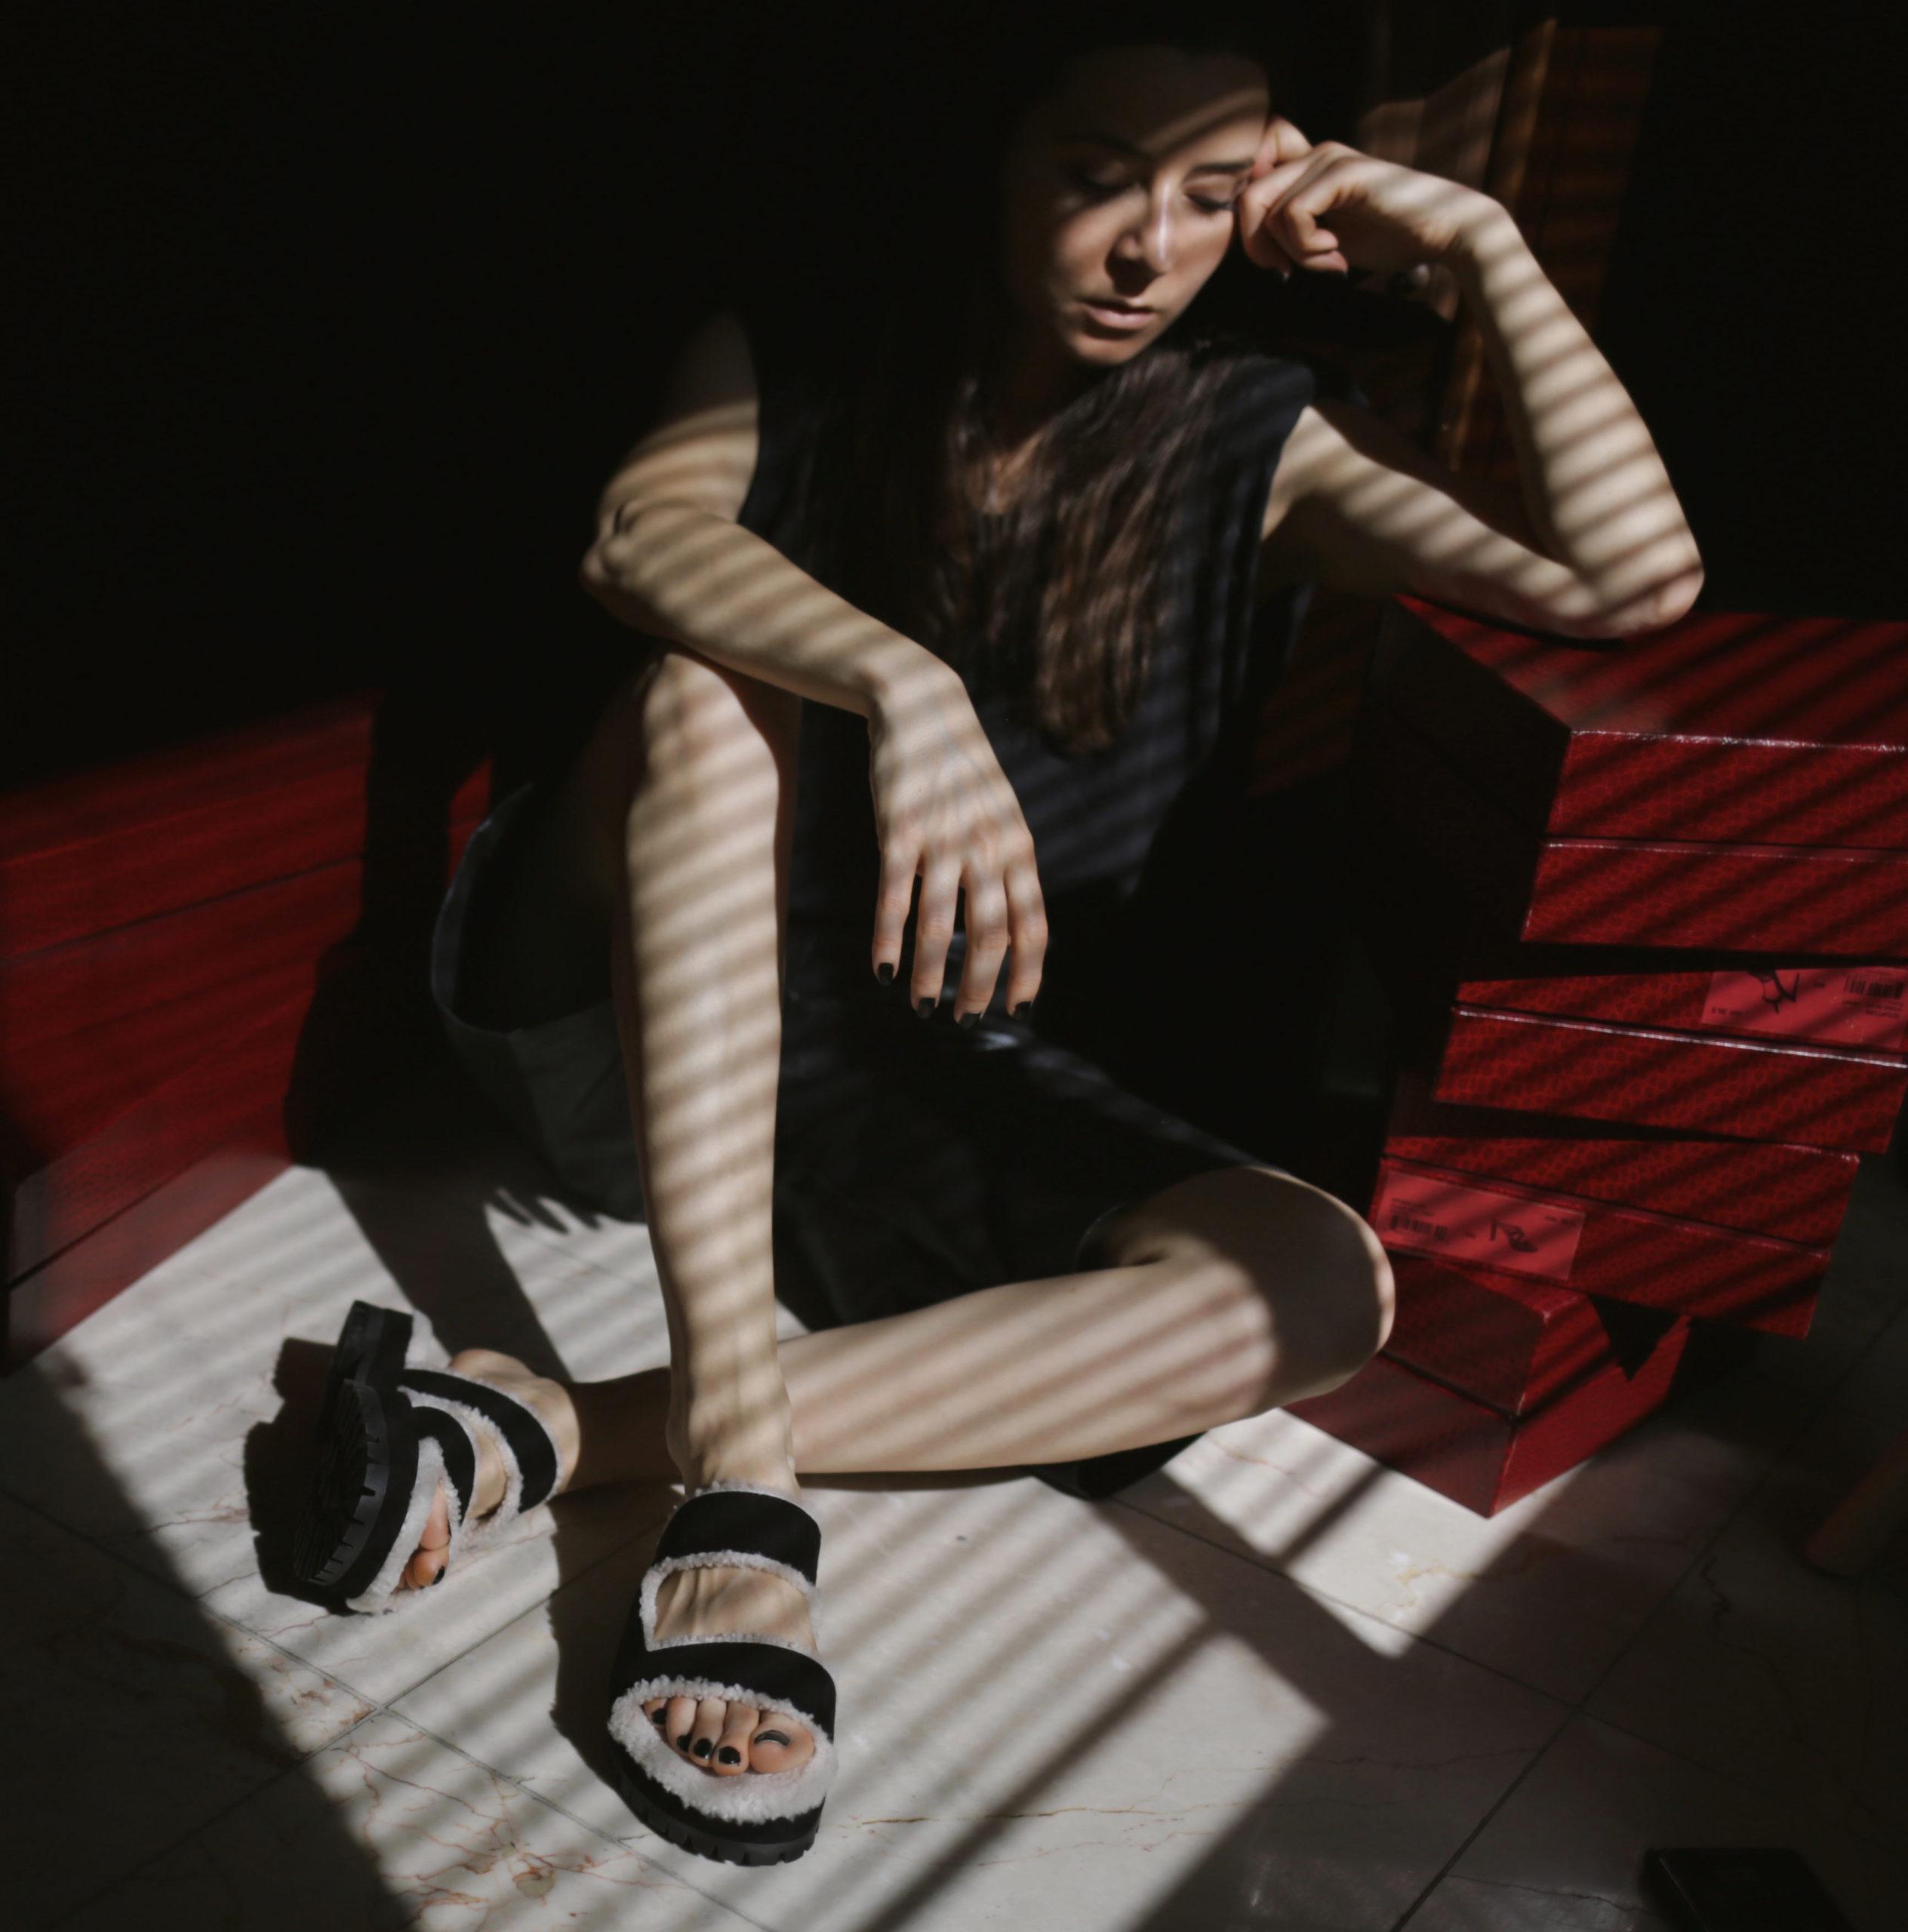 Best Fall Winter 2020 shoes and boots trends: The designer comfortable slides TAMARA MELLON ROAR SLIDES